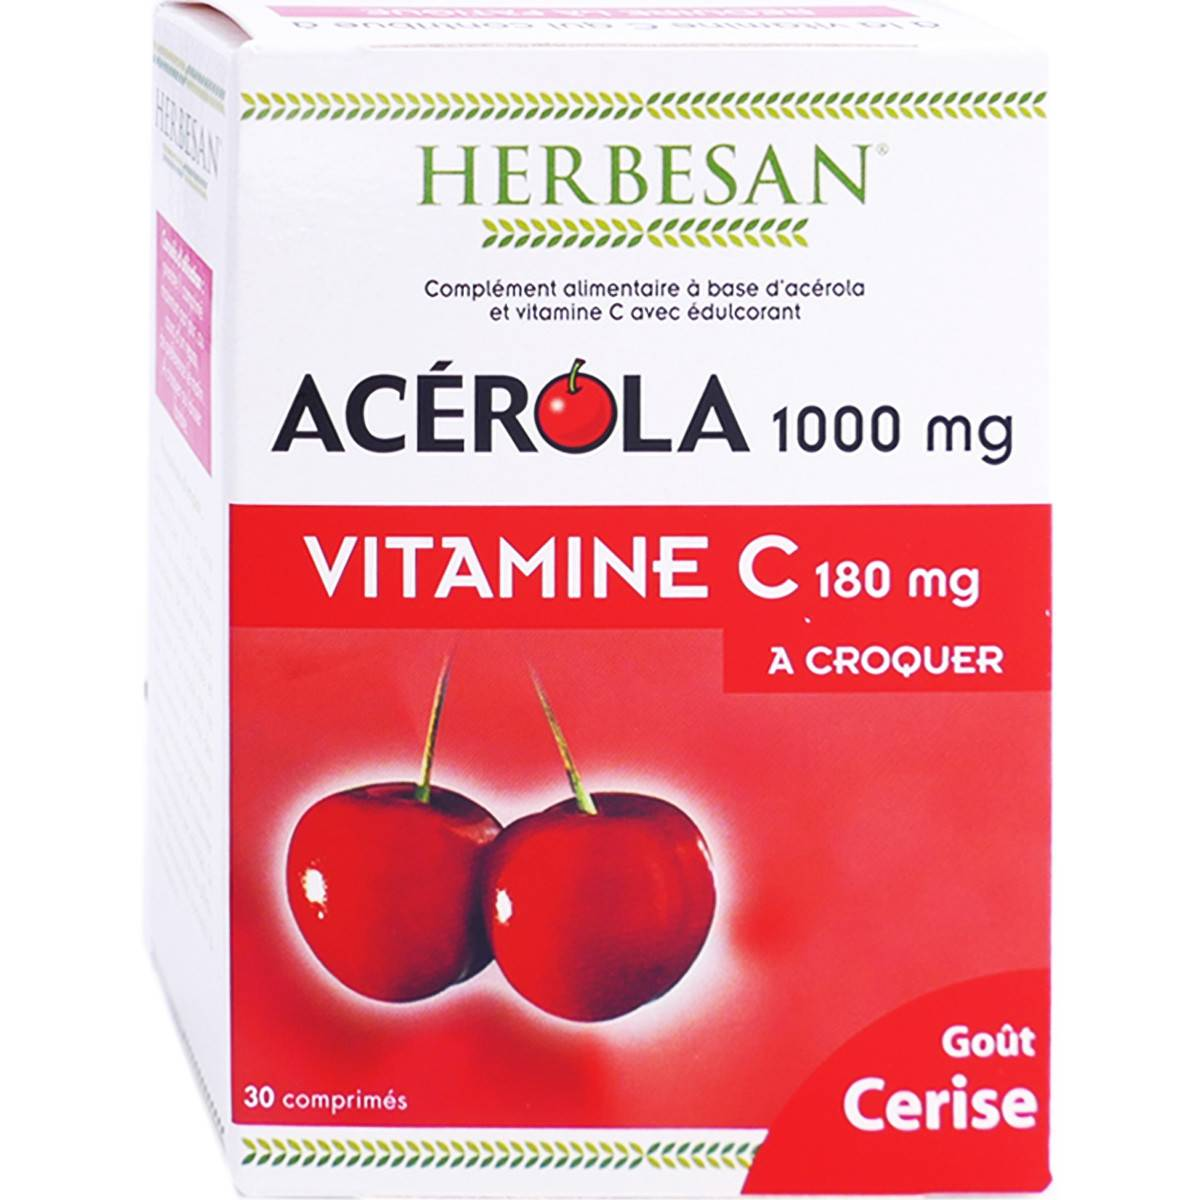 herbesan acerola 1000 vitamine c 180mg a croquer